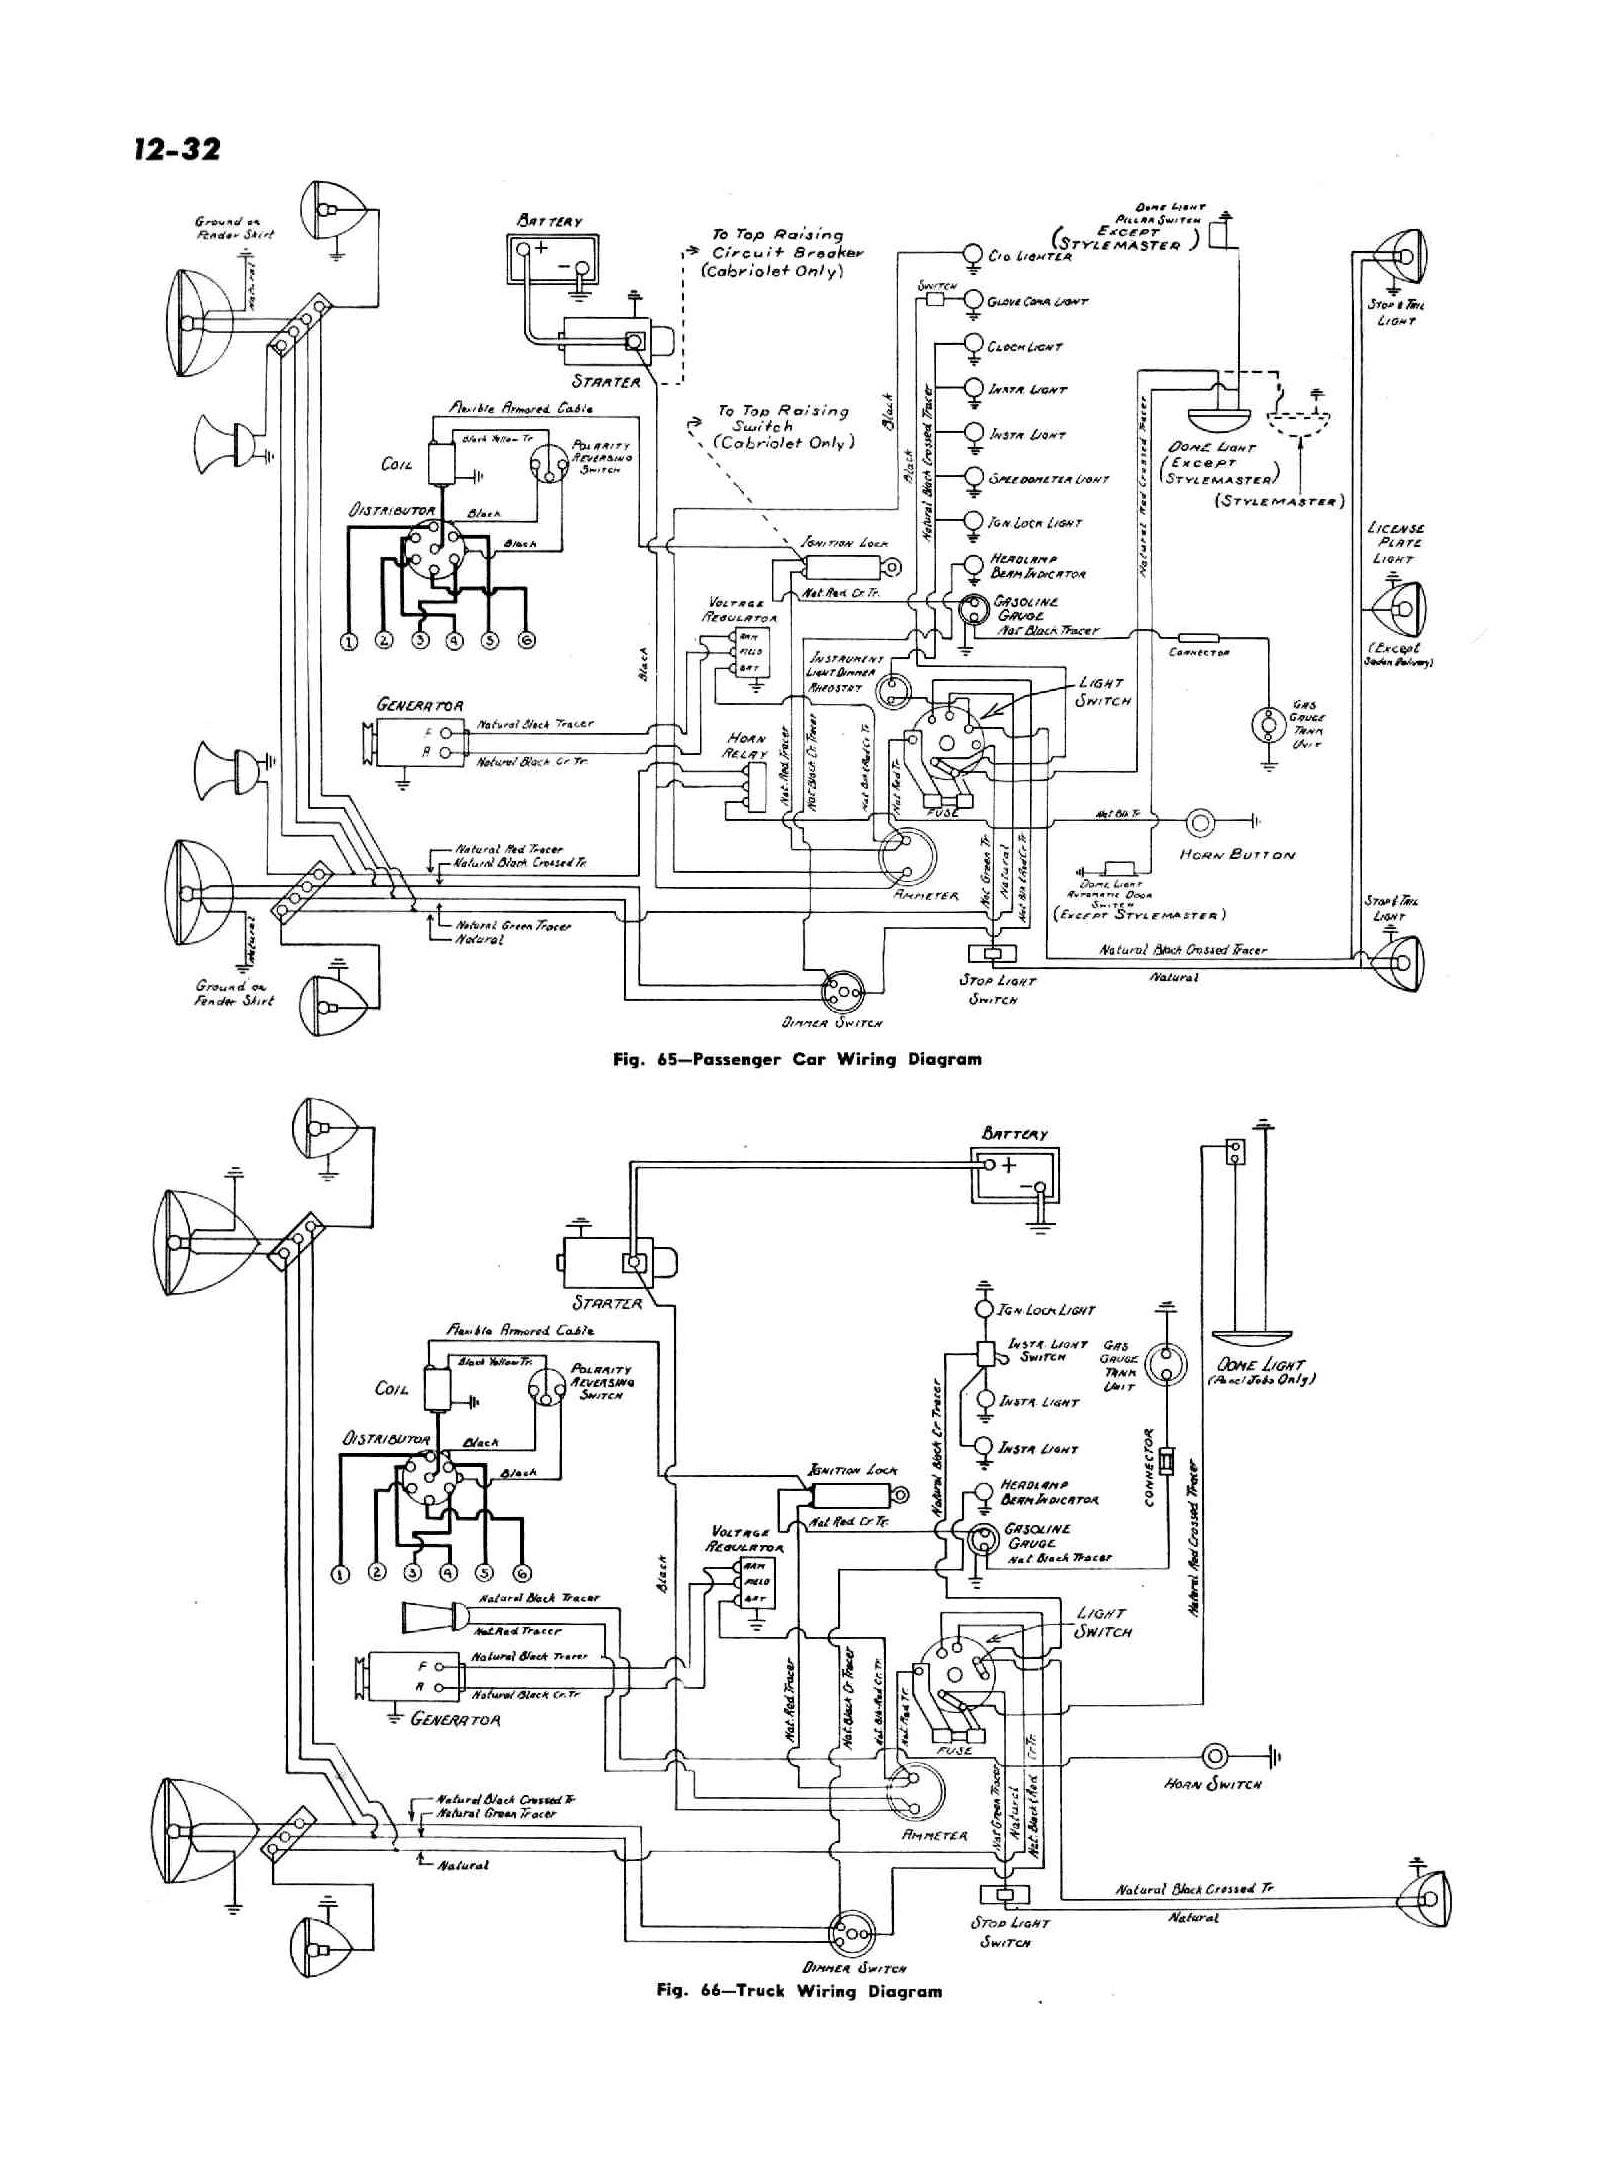 Amazing 1963 Avanti Wiring Diagram Electronic Schematics Collections Wiring Cloud Hisonepsysticxongrecoveryedborg